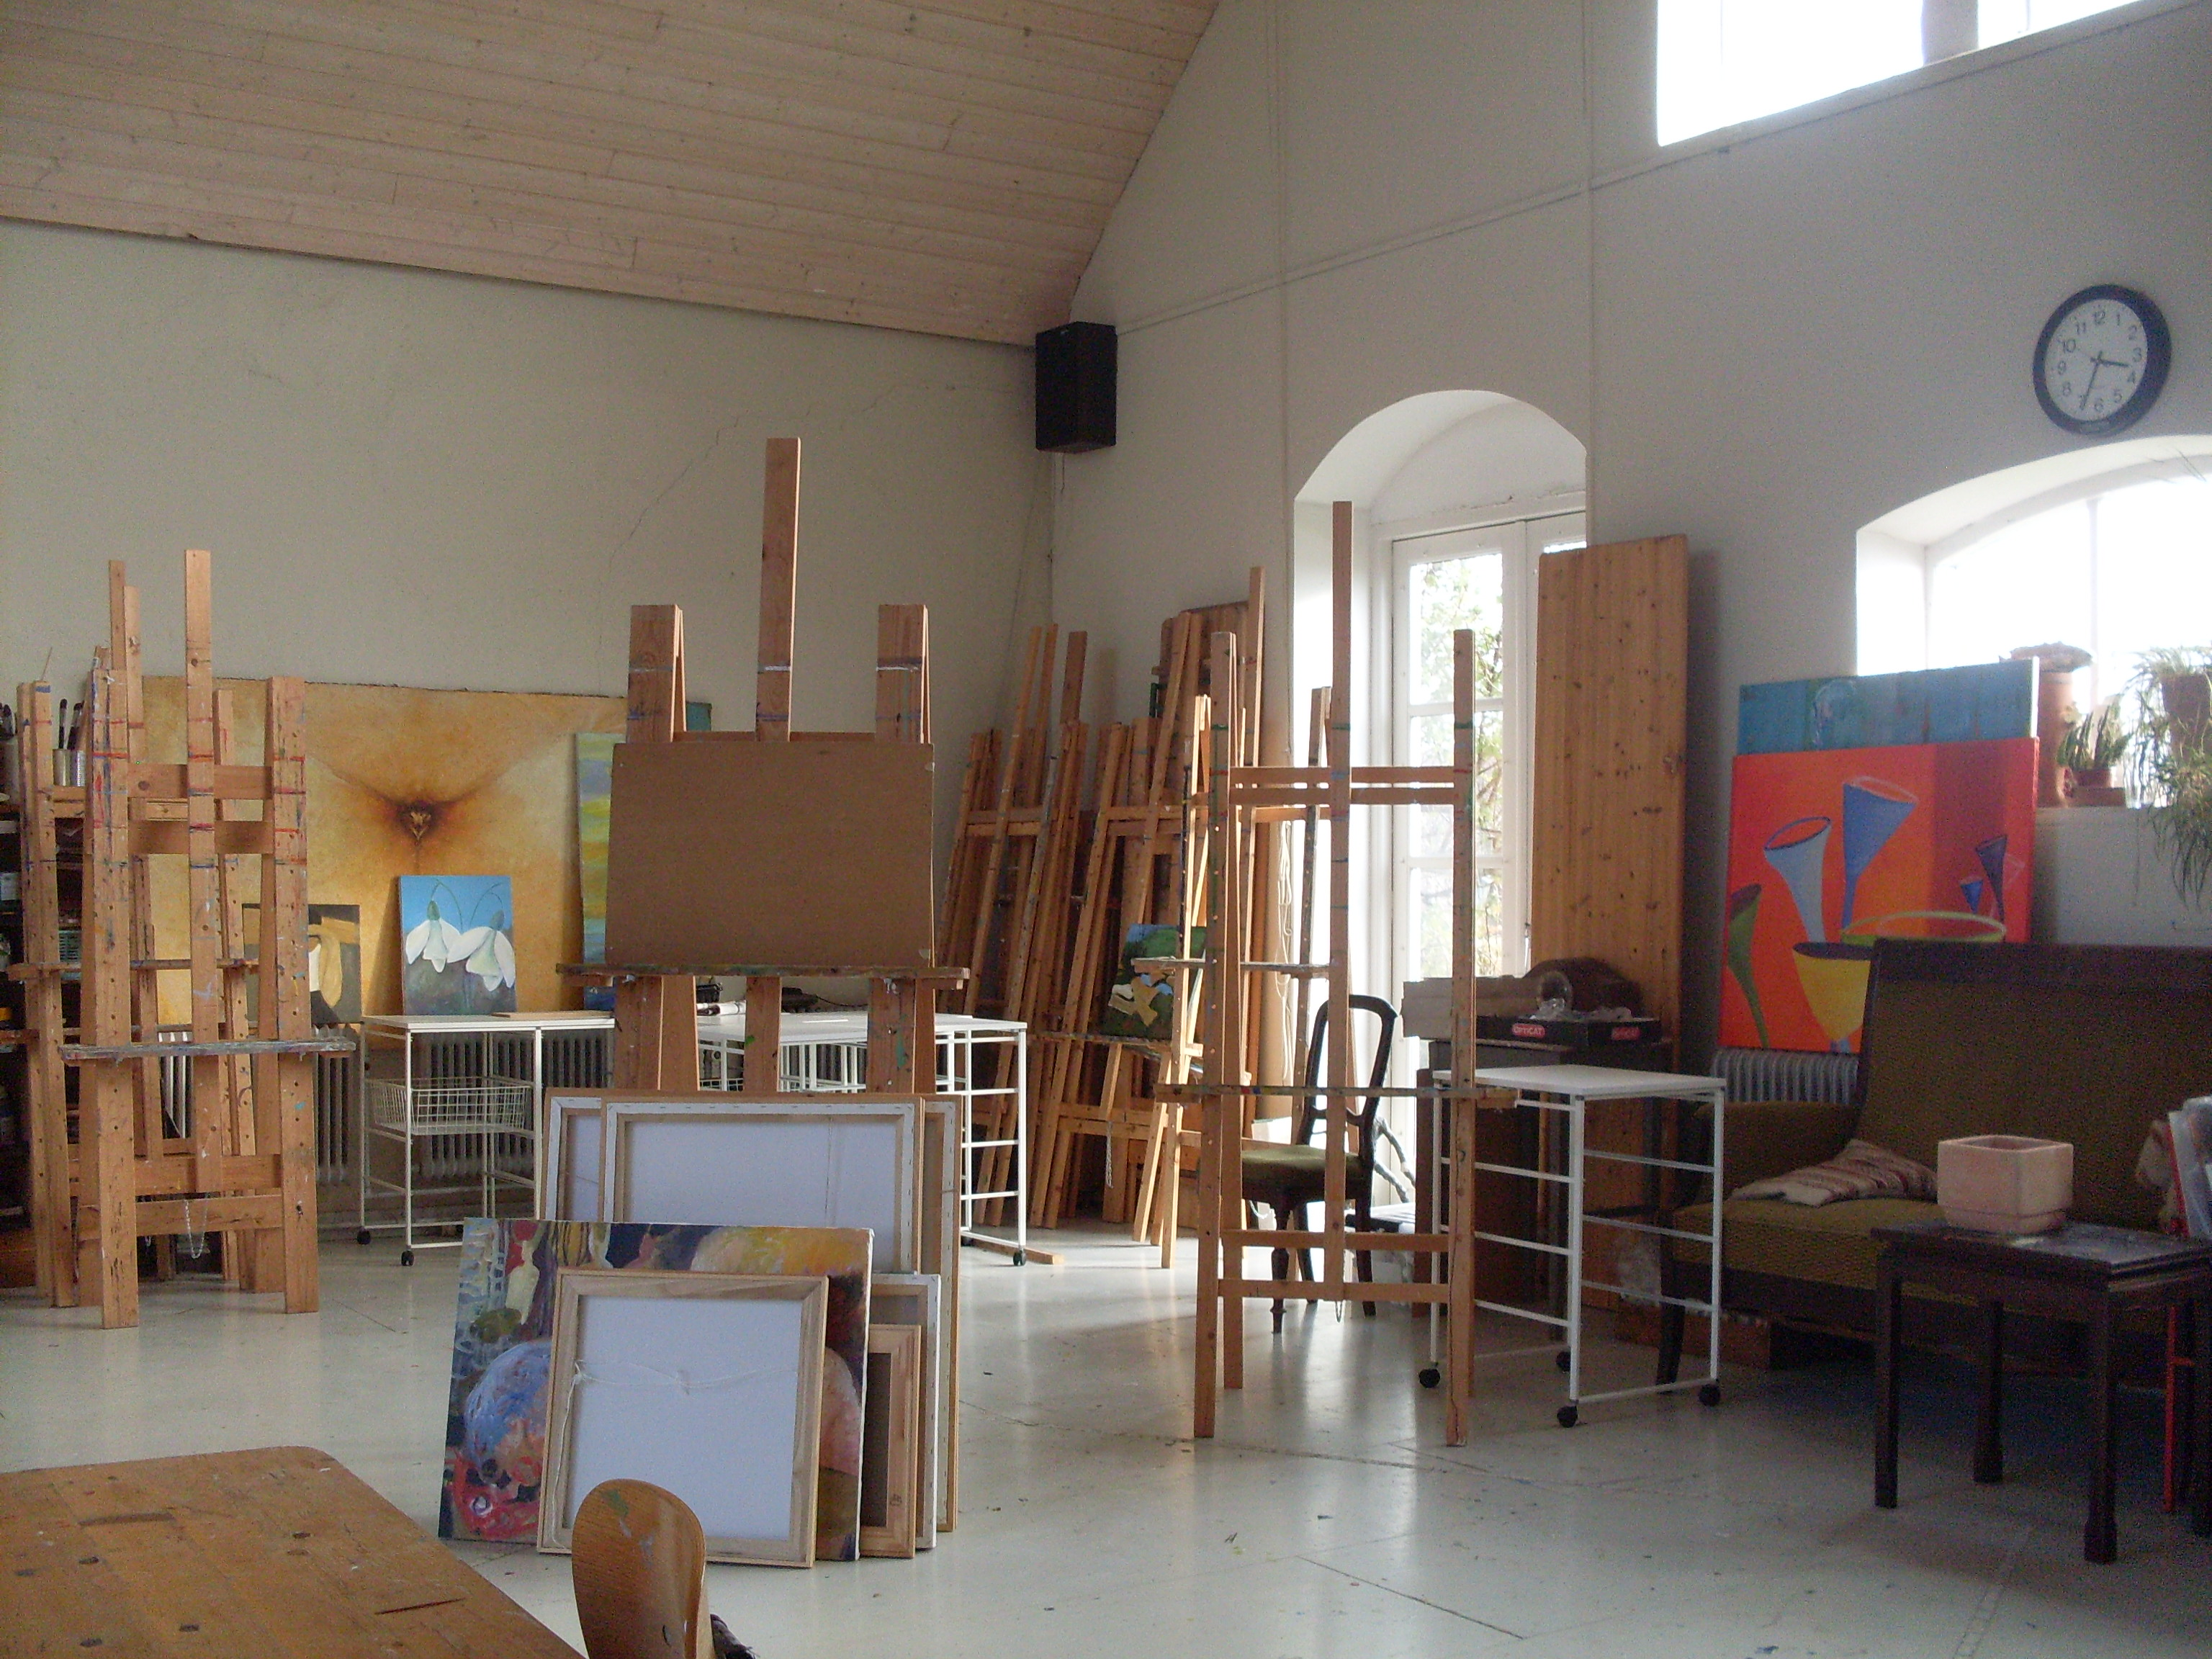 kragekær kunstskole salen